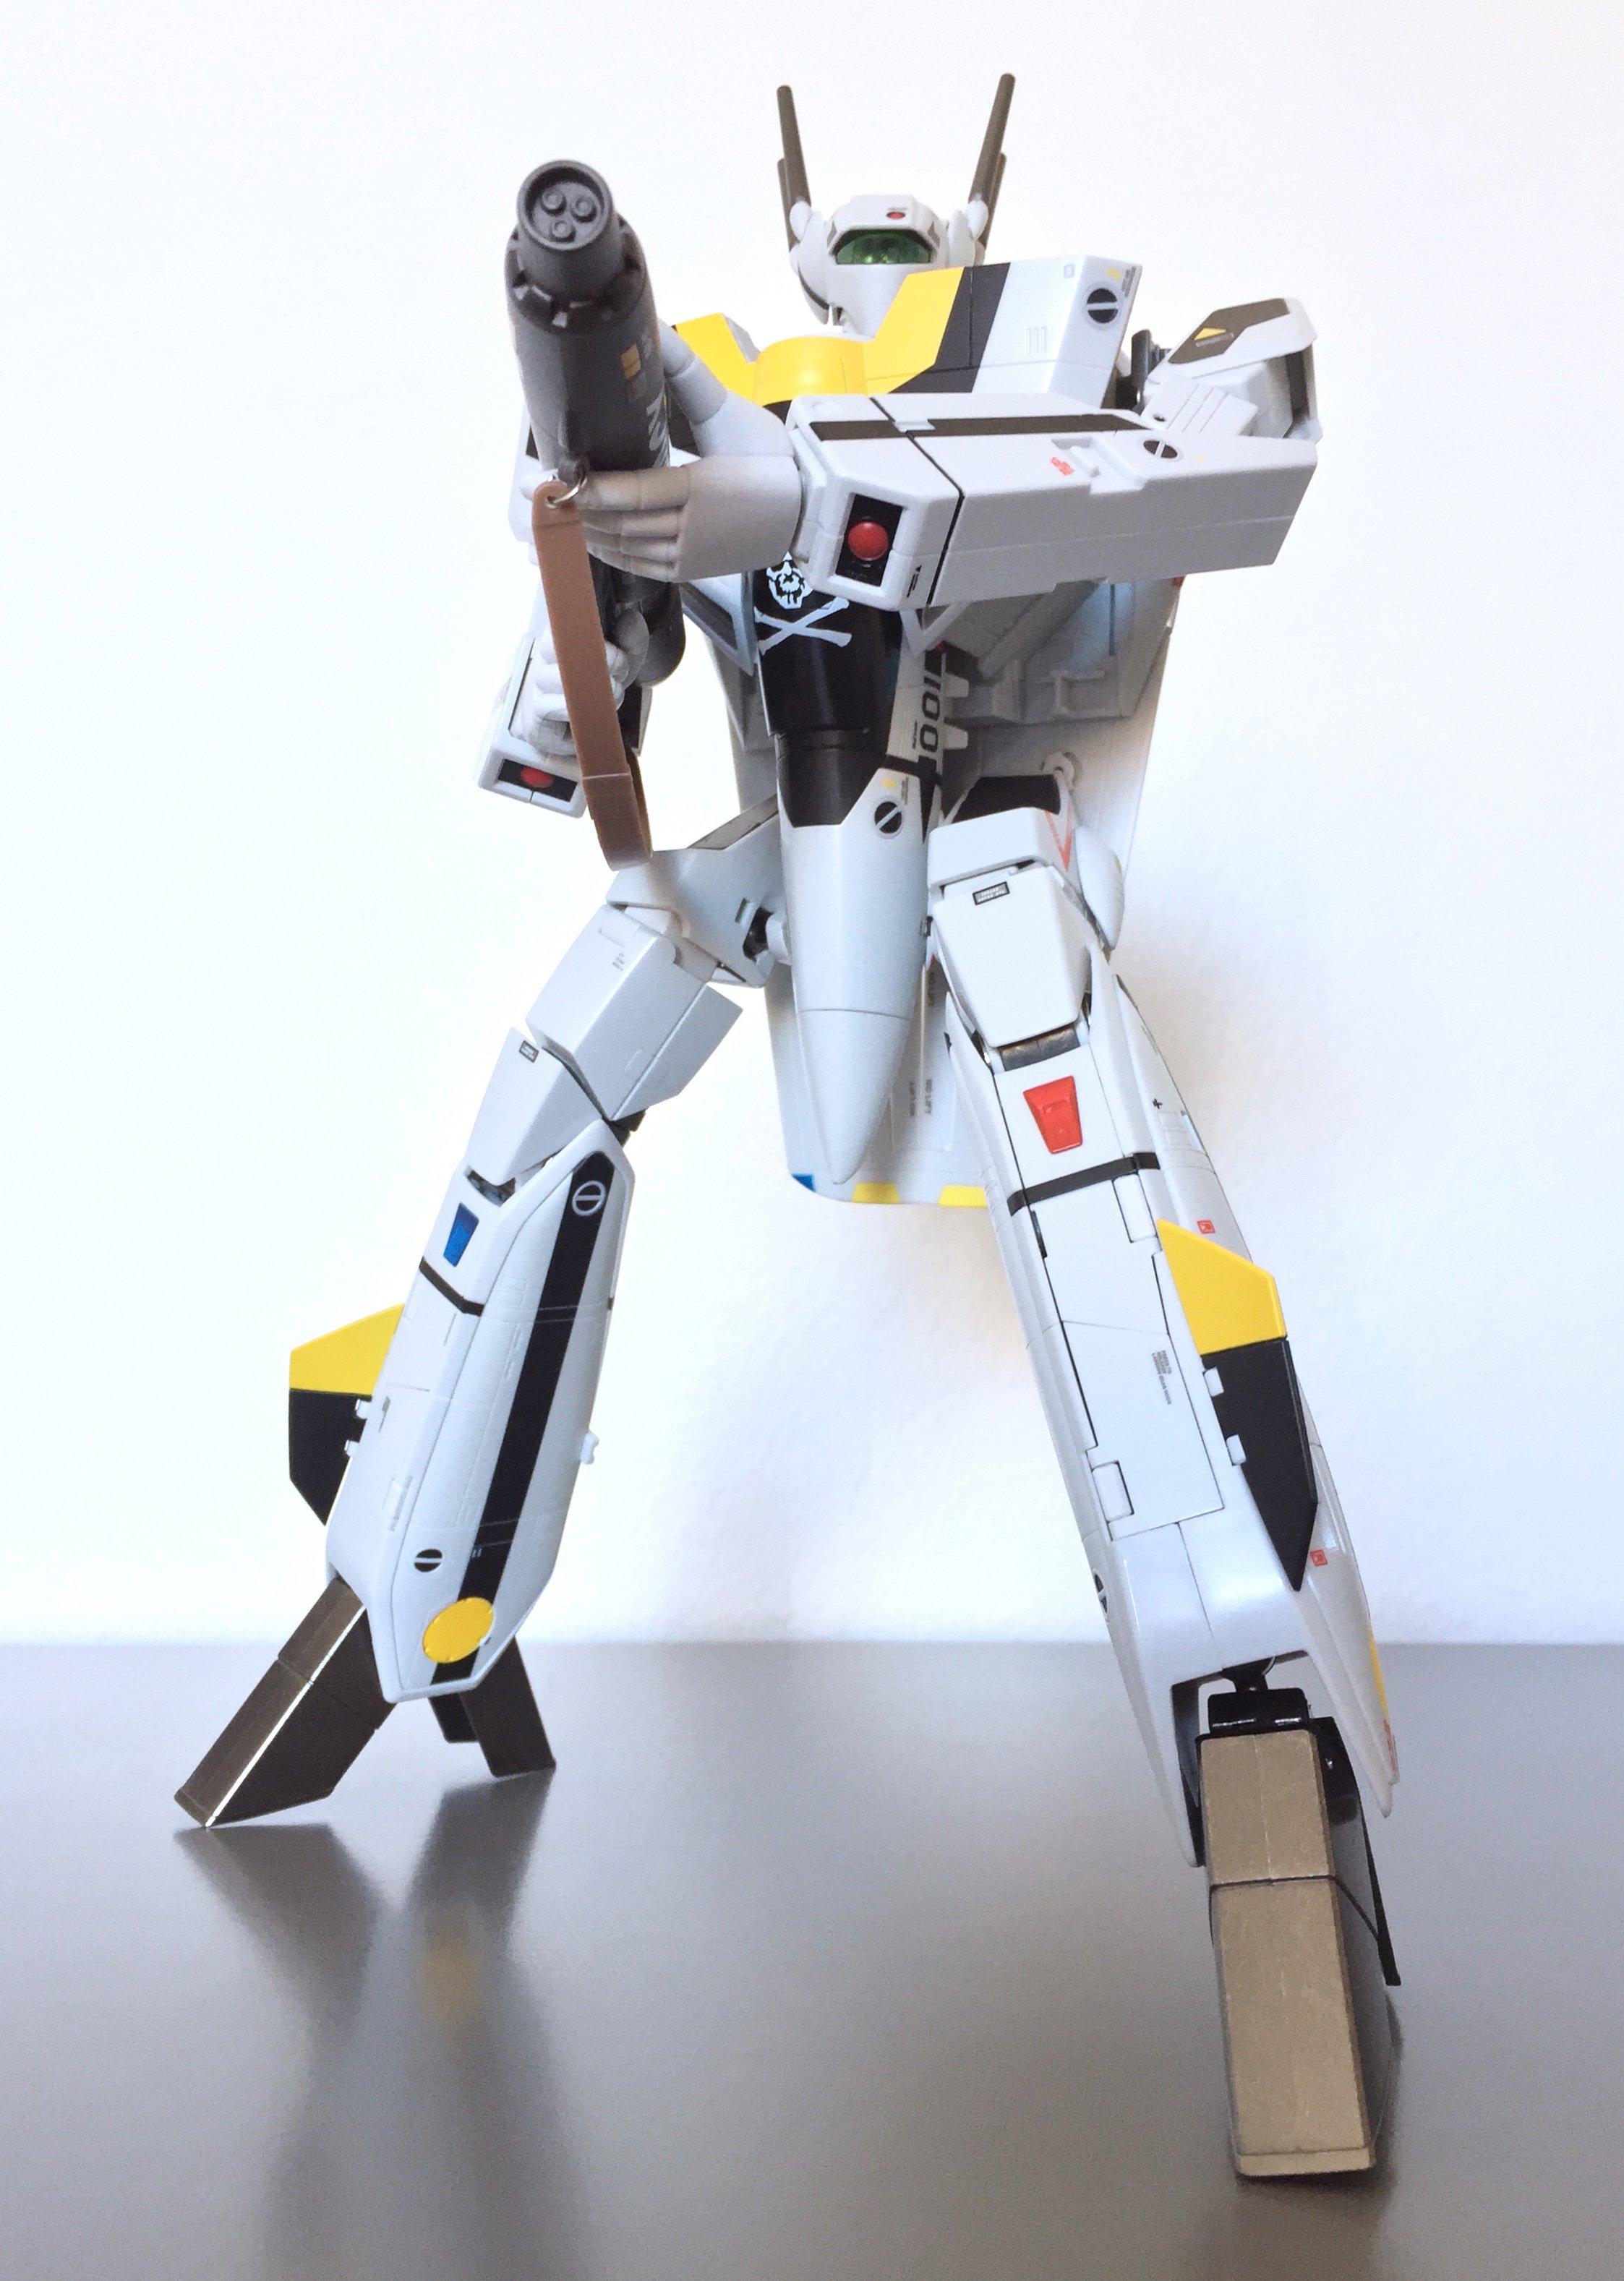 dxvf1sroy11